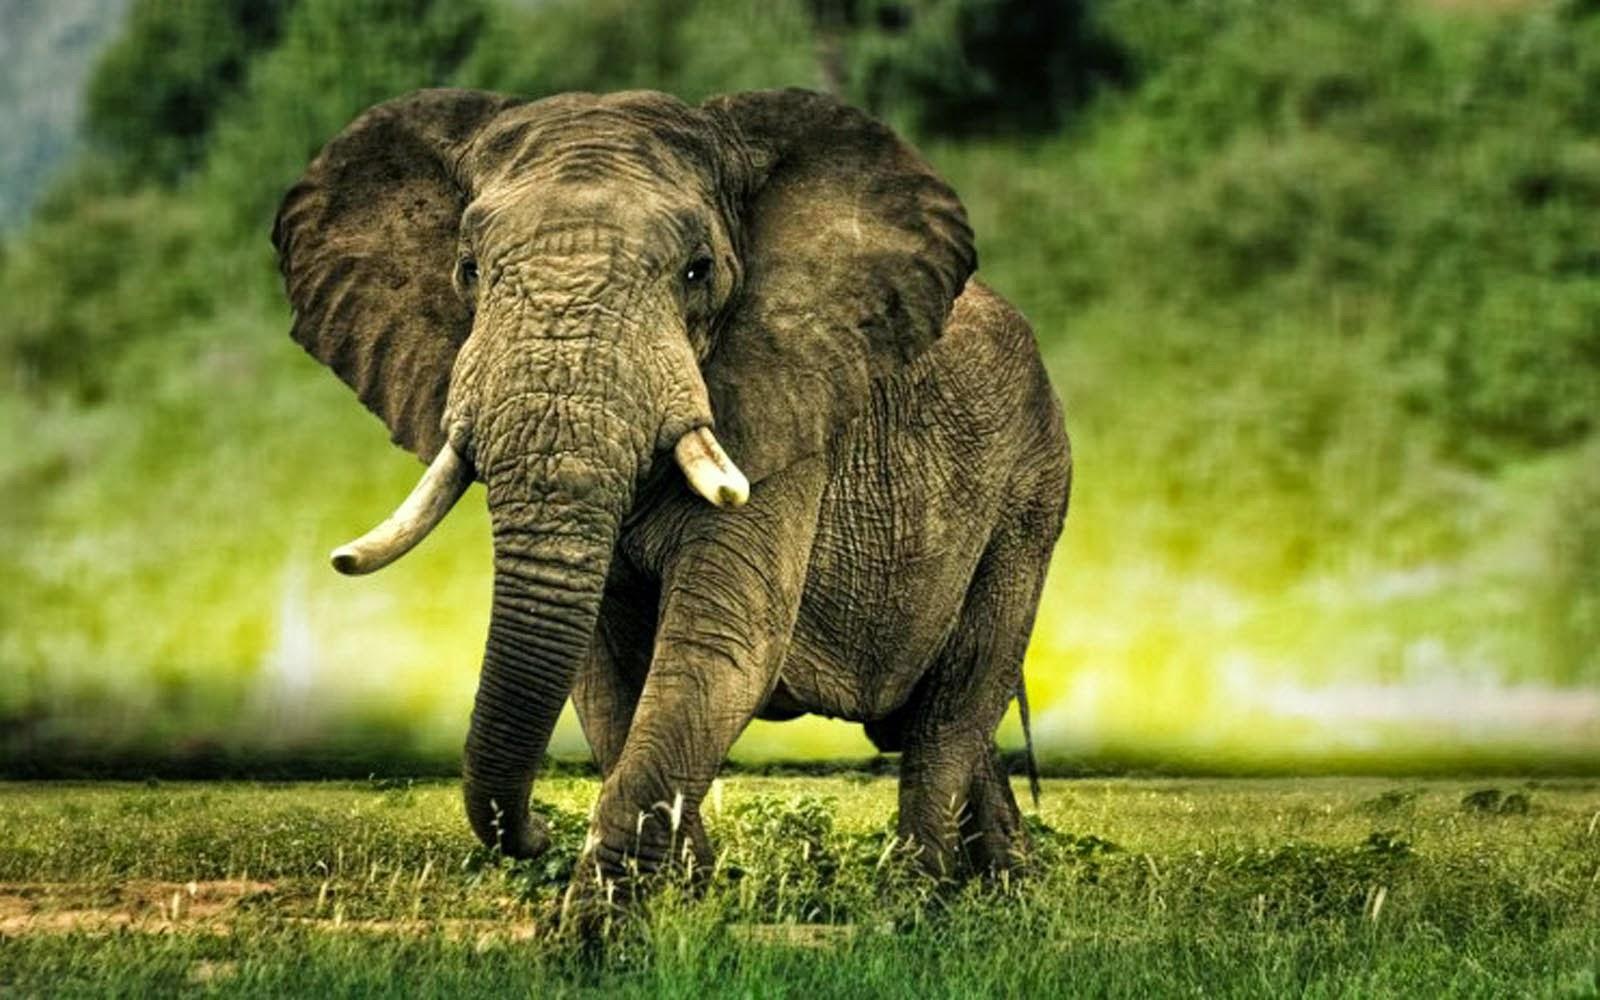 elephants wallpapers world - photo #11